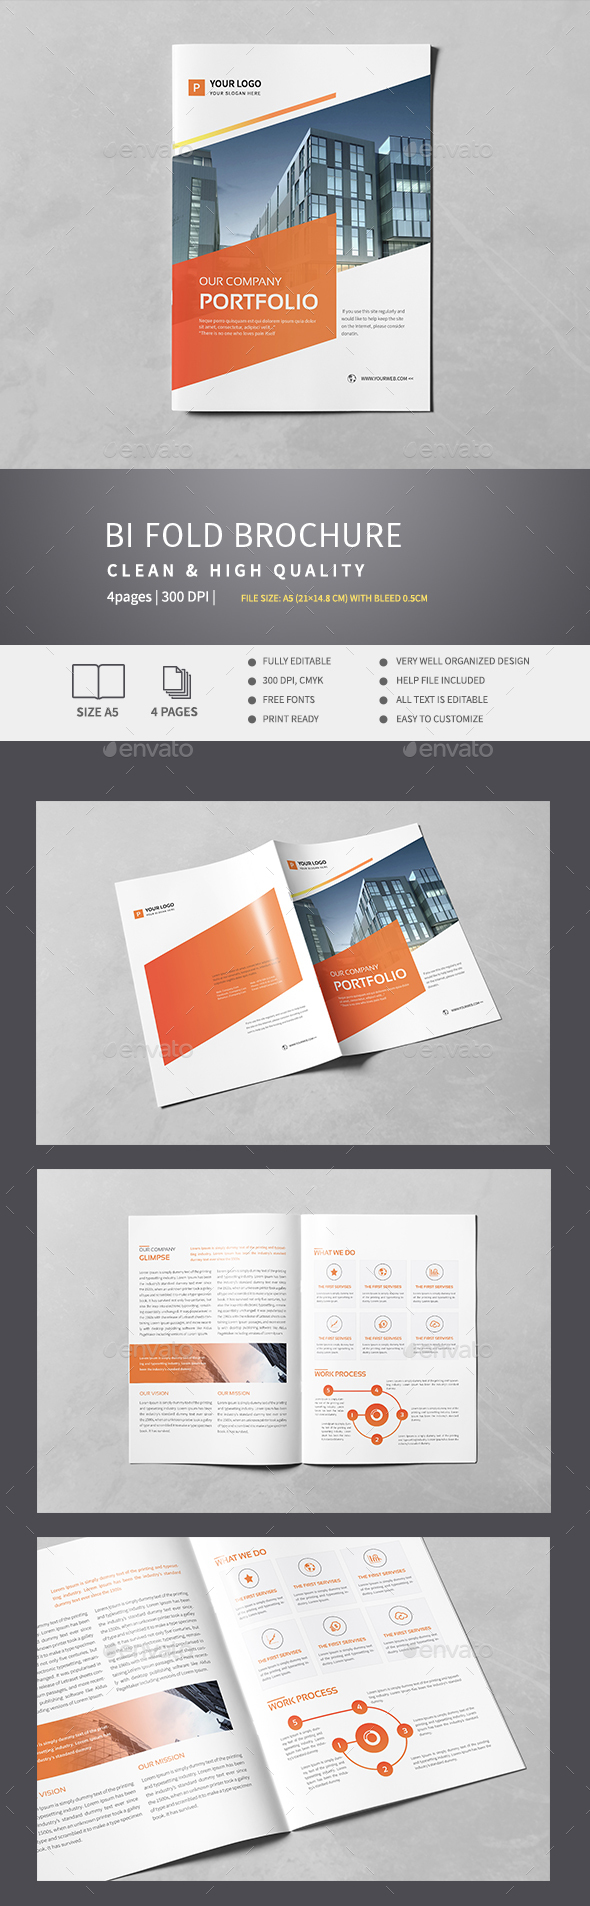 Corporate Bi-Fold Brochure v.1 - Corporate Brochures